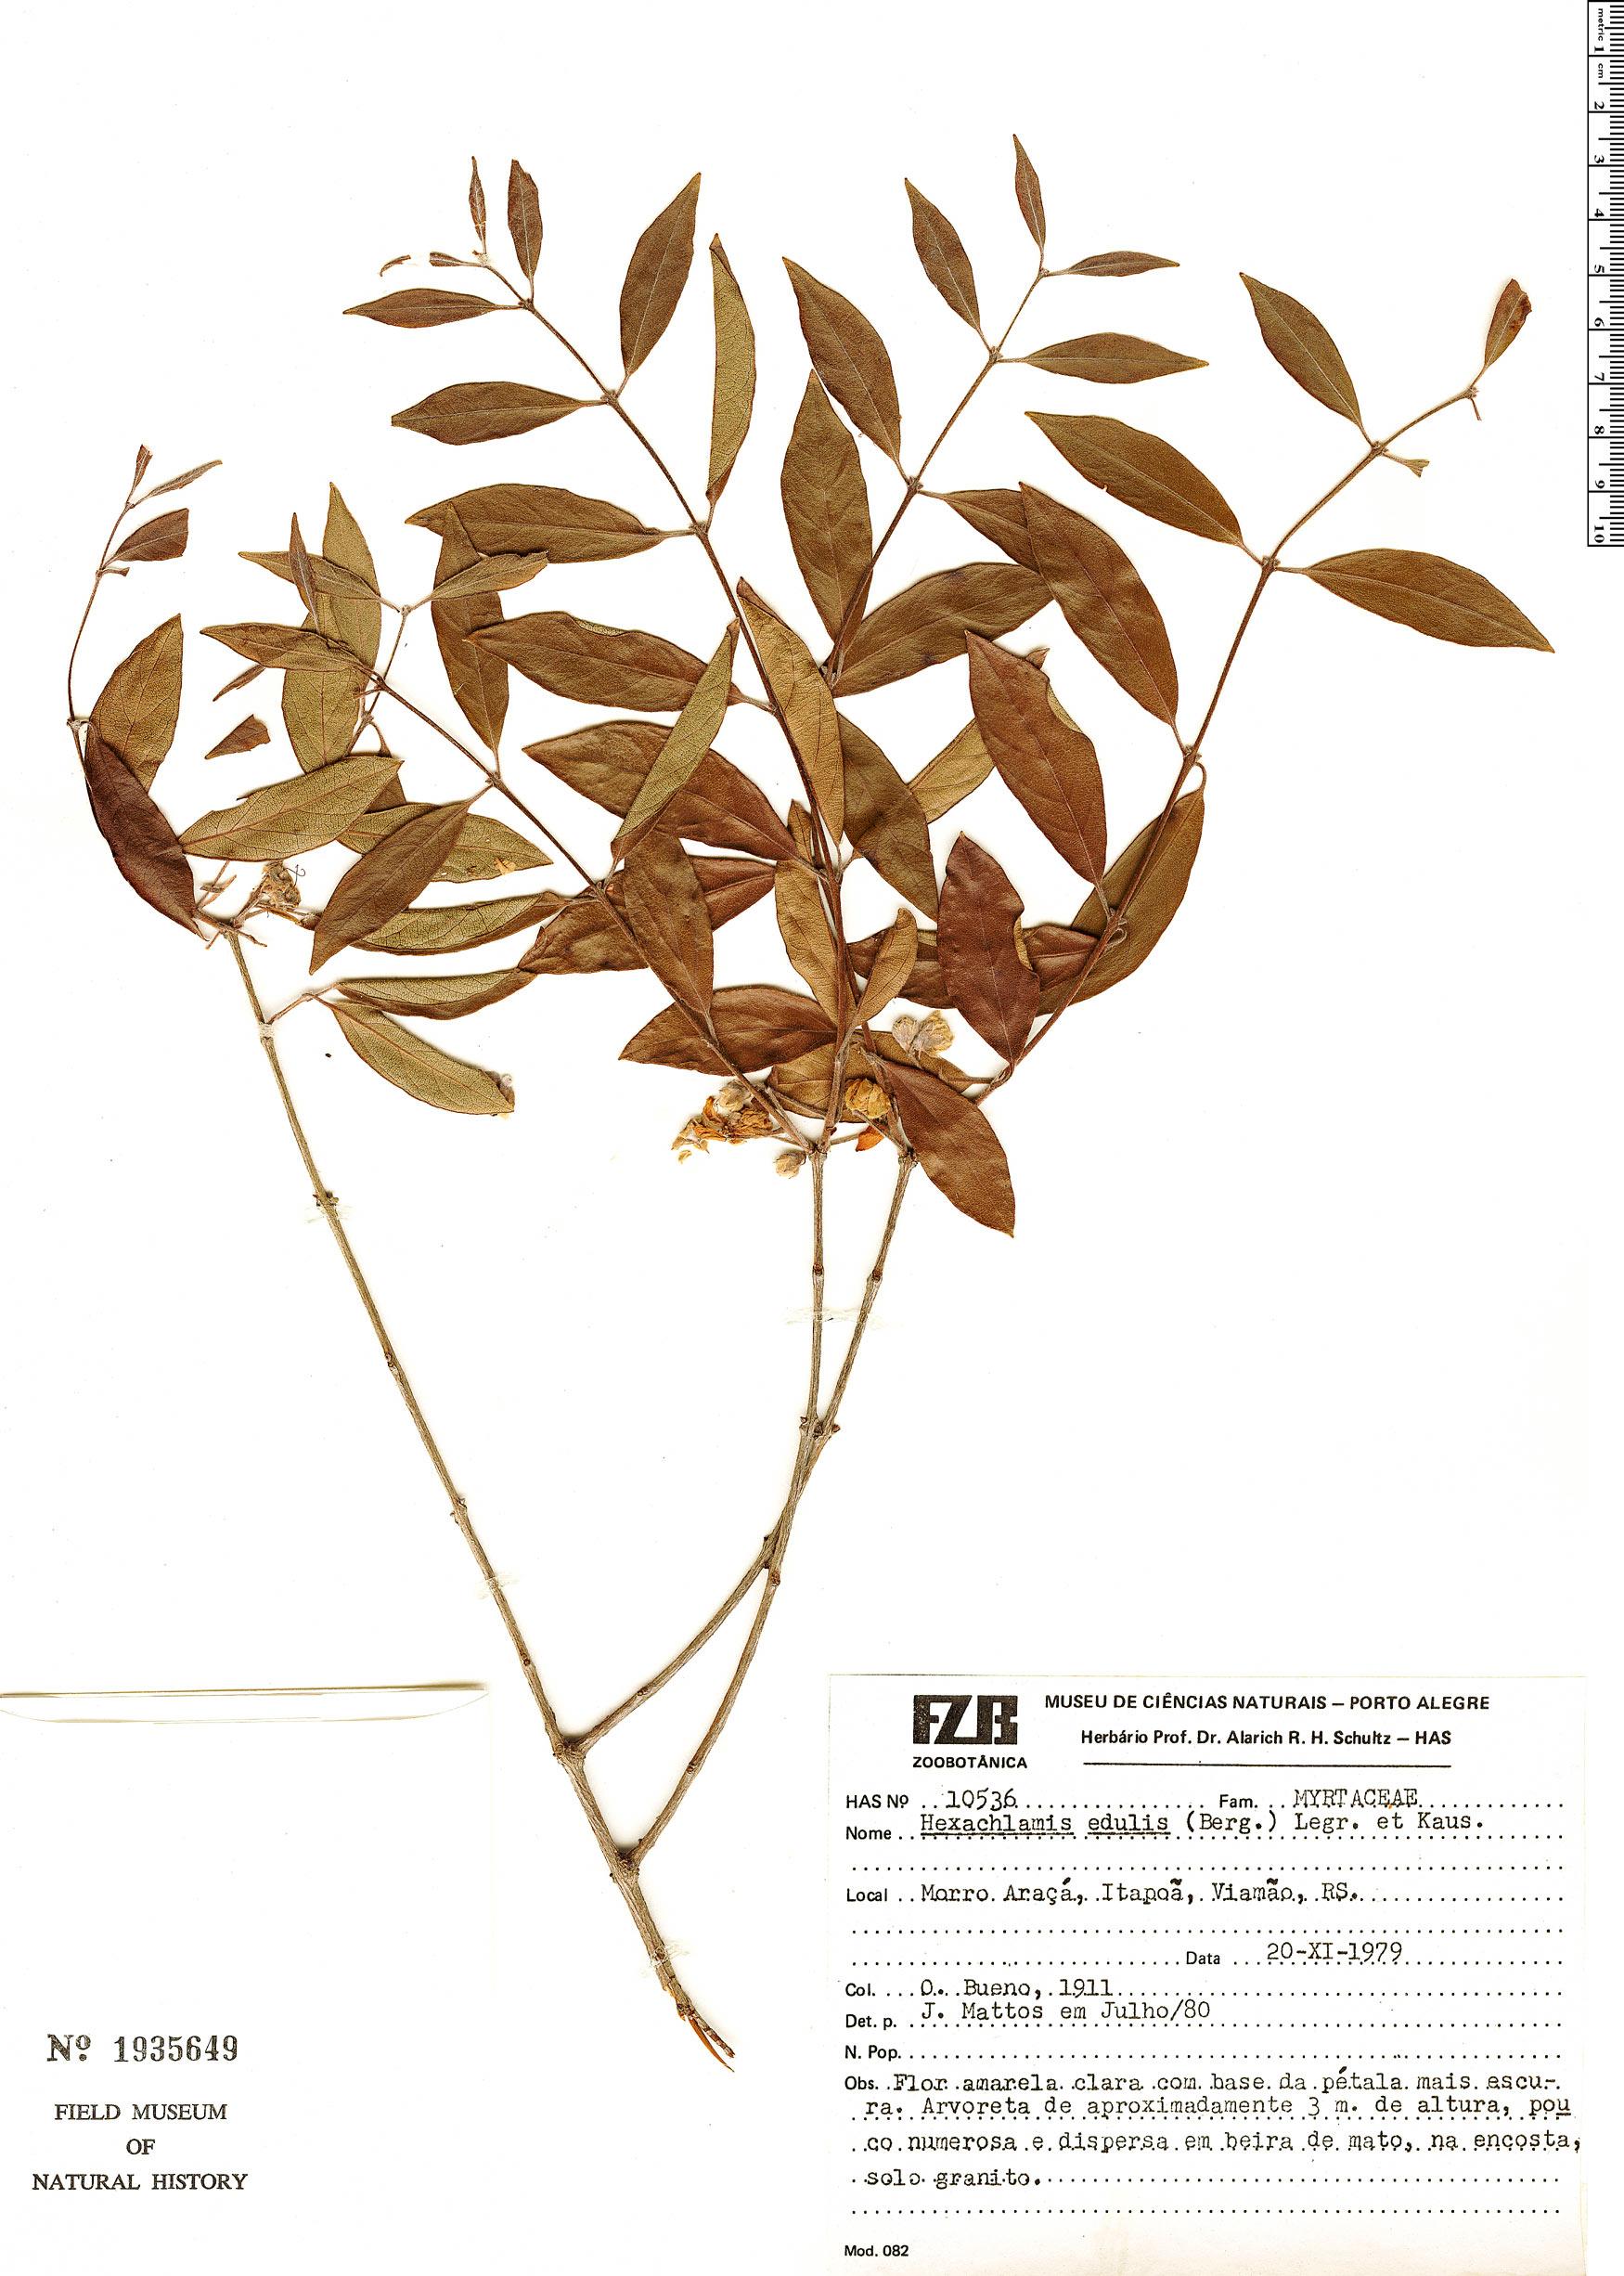 Specimen: Hexachlamys edulis